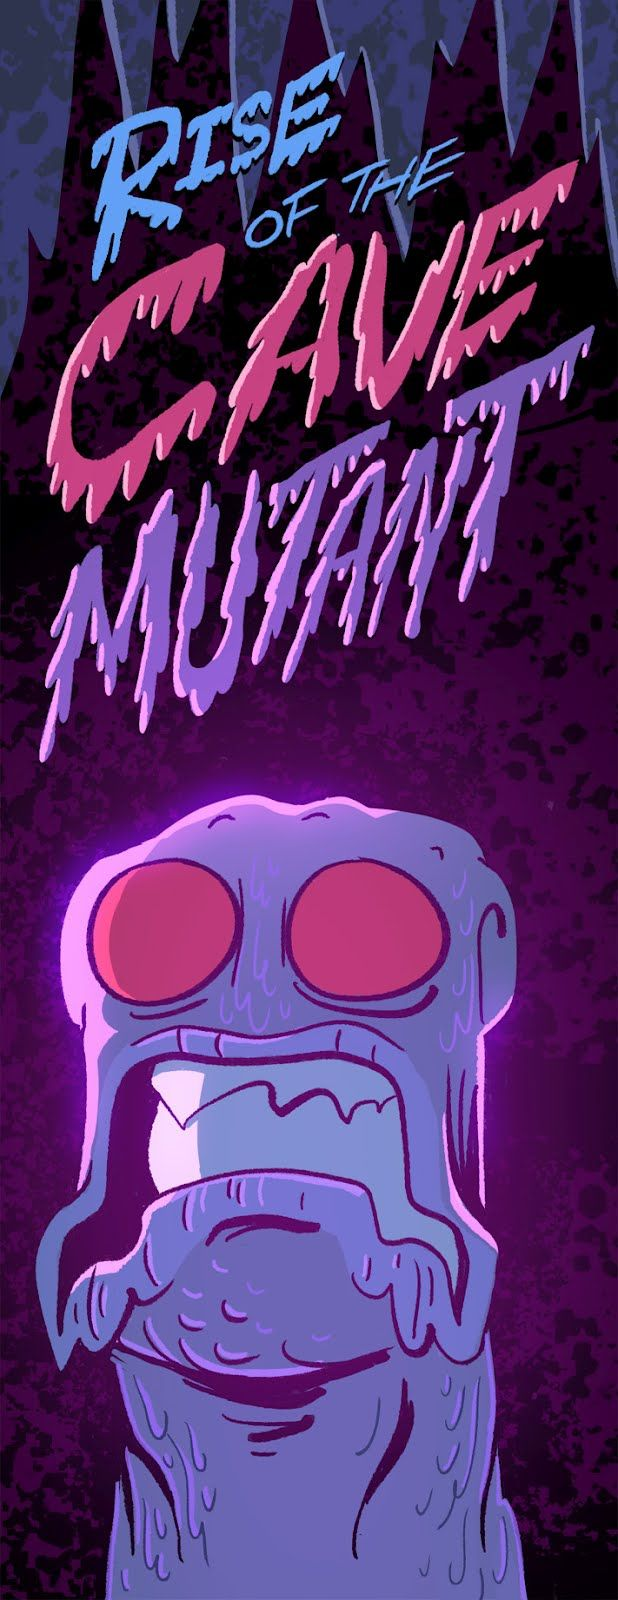 Justin Parpan Blog: Rise of the Cave Mutant